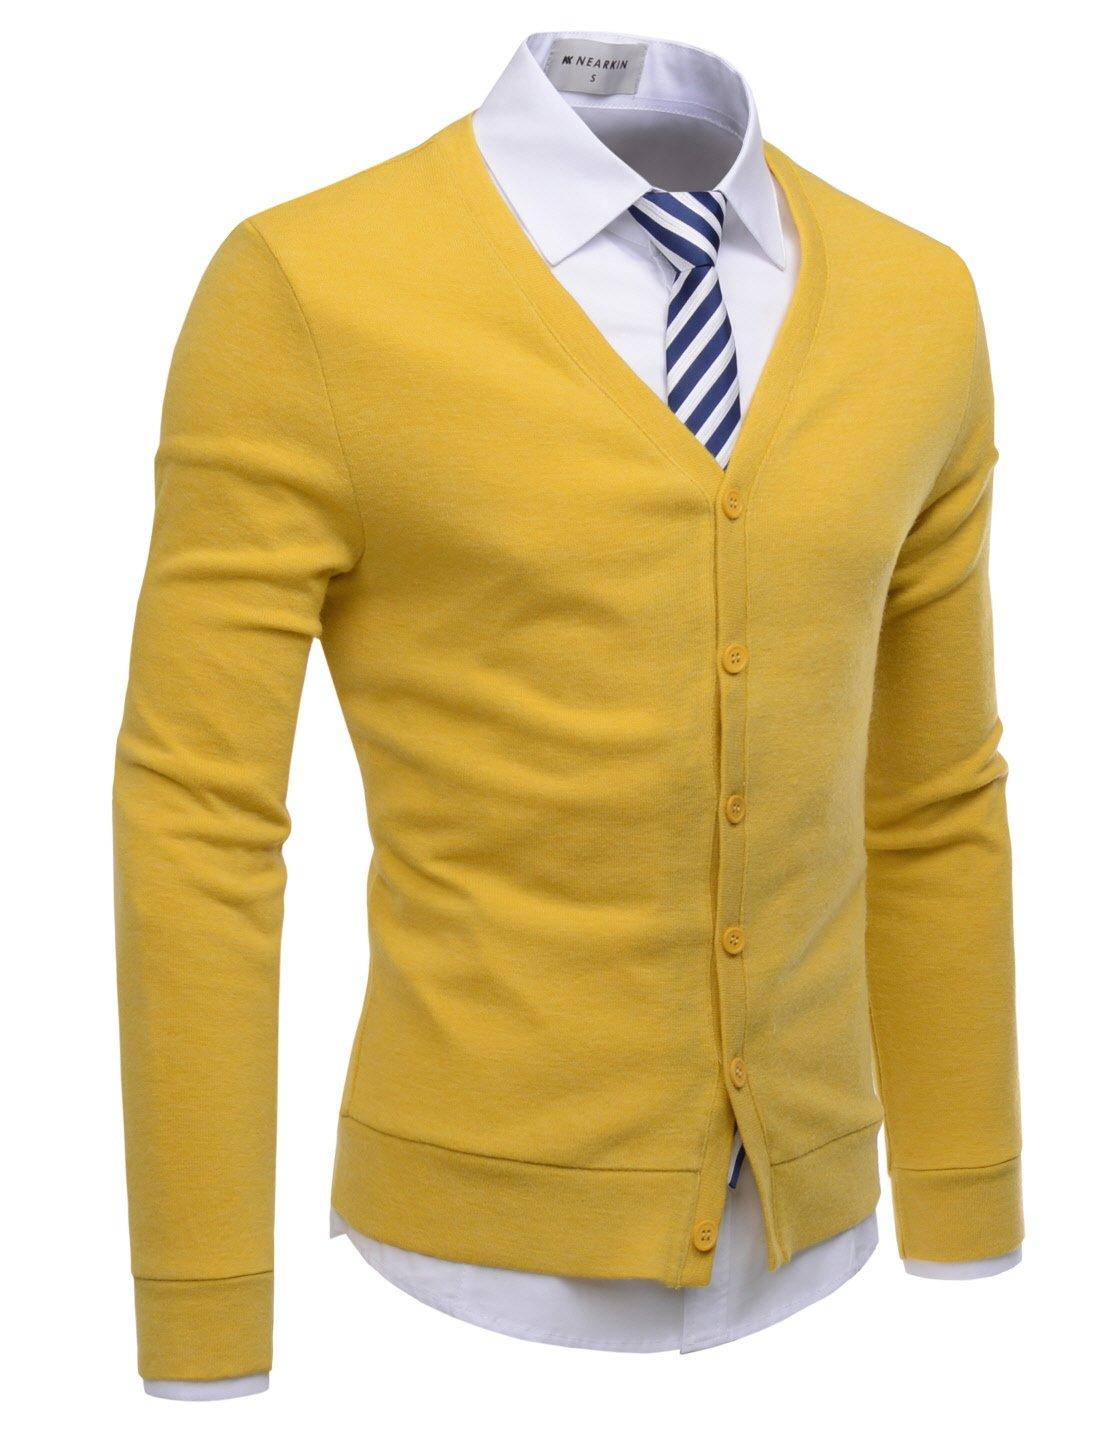 NEARKIN (NKNKCAC1) Mens Knitwear City Casual Slim Cut Long Sleeve Cardigan Sweaters MUSTARD US L(Tag size L)